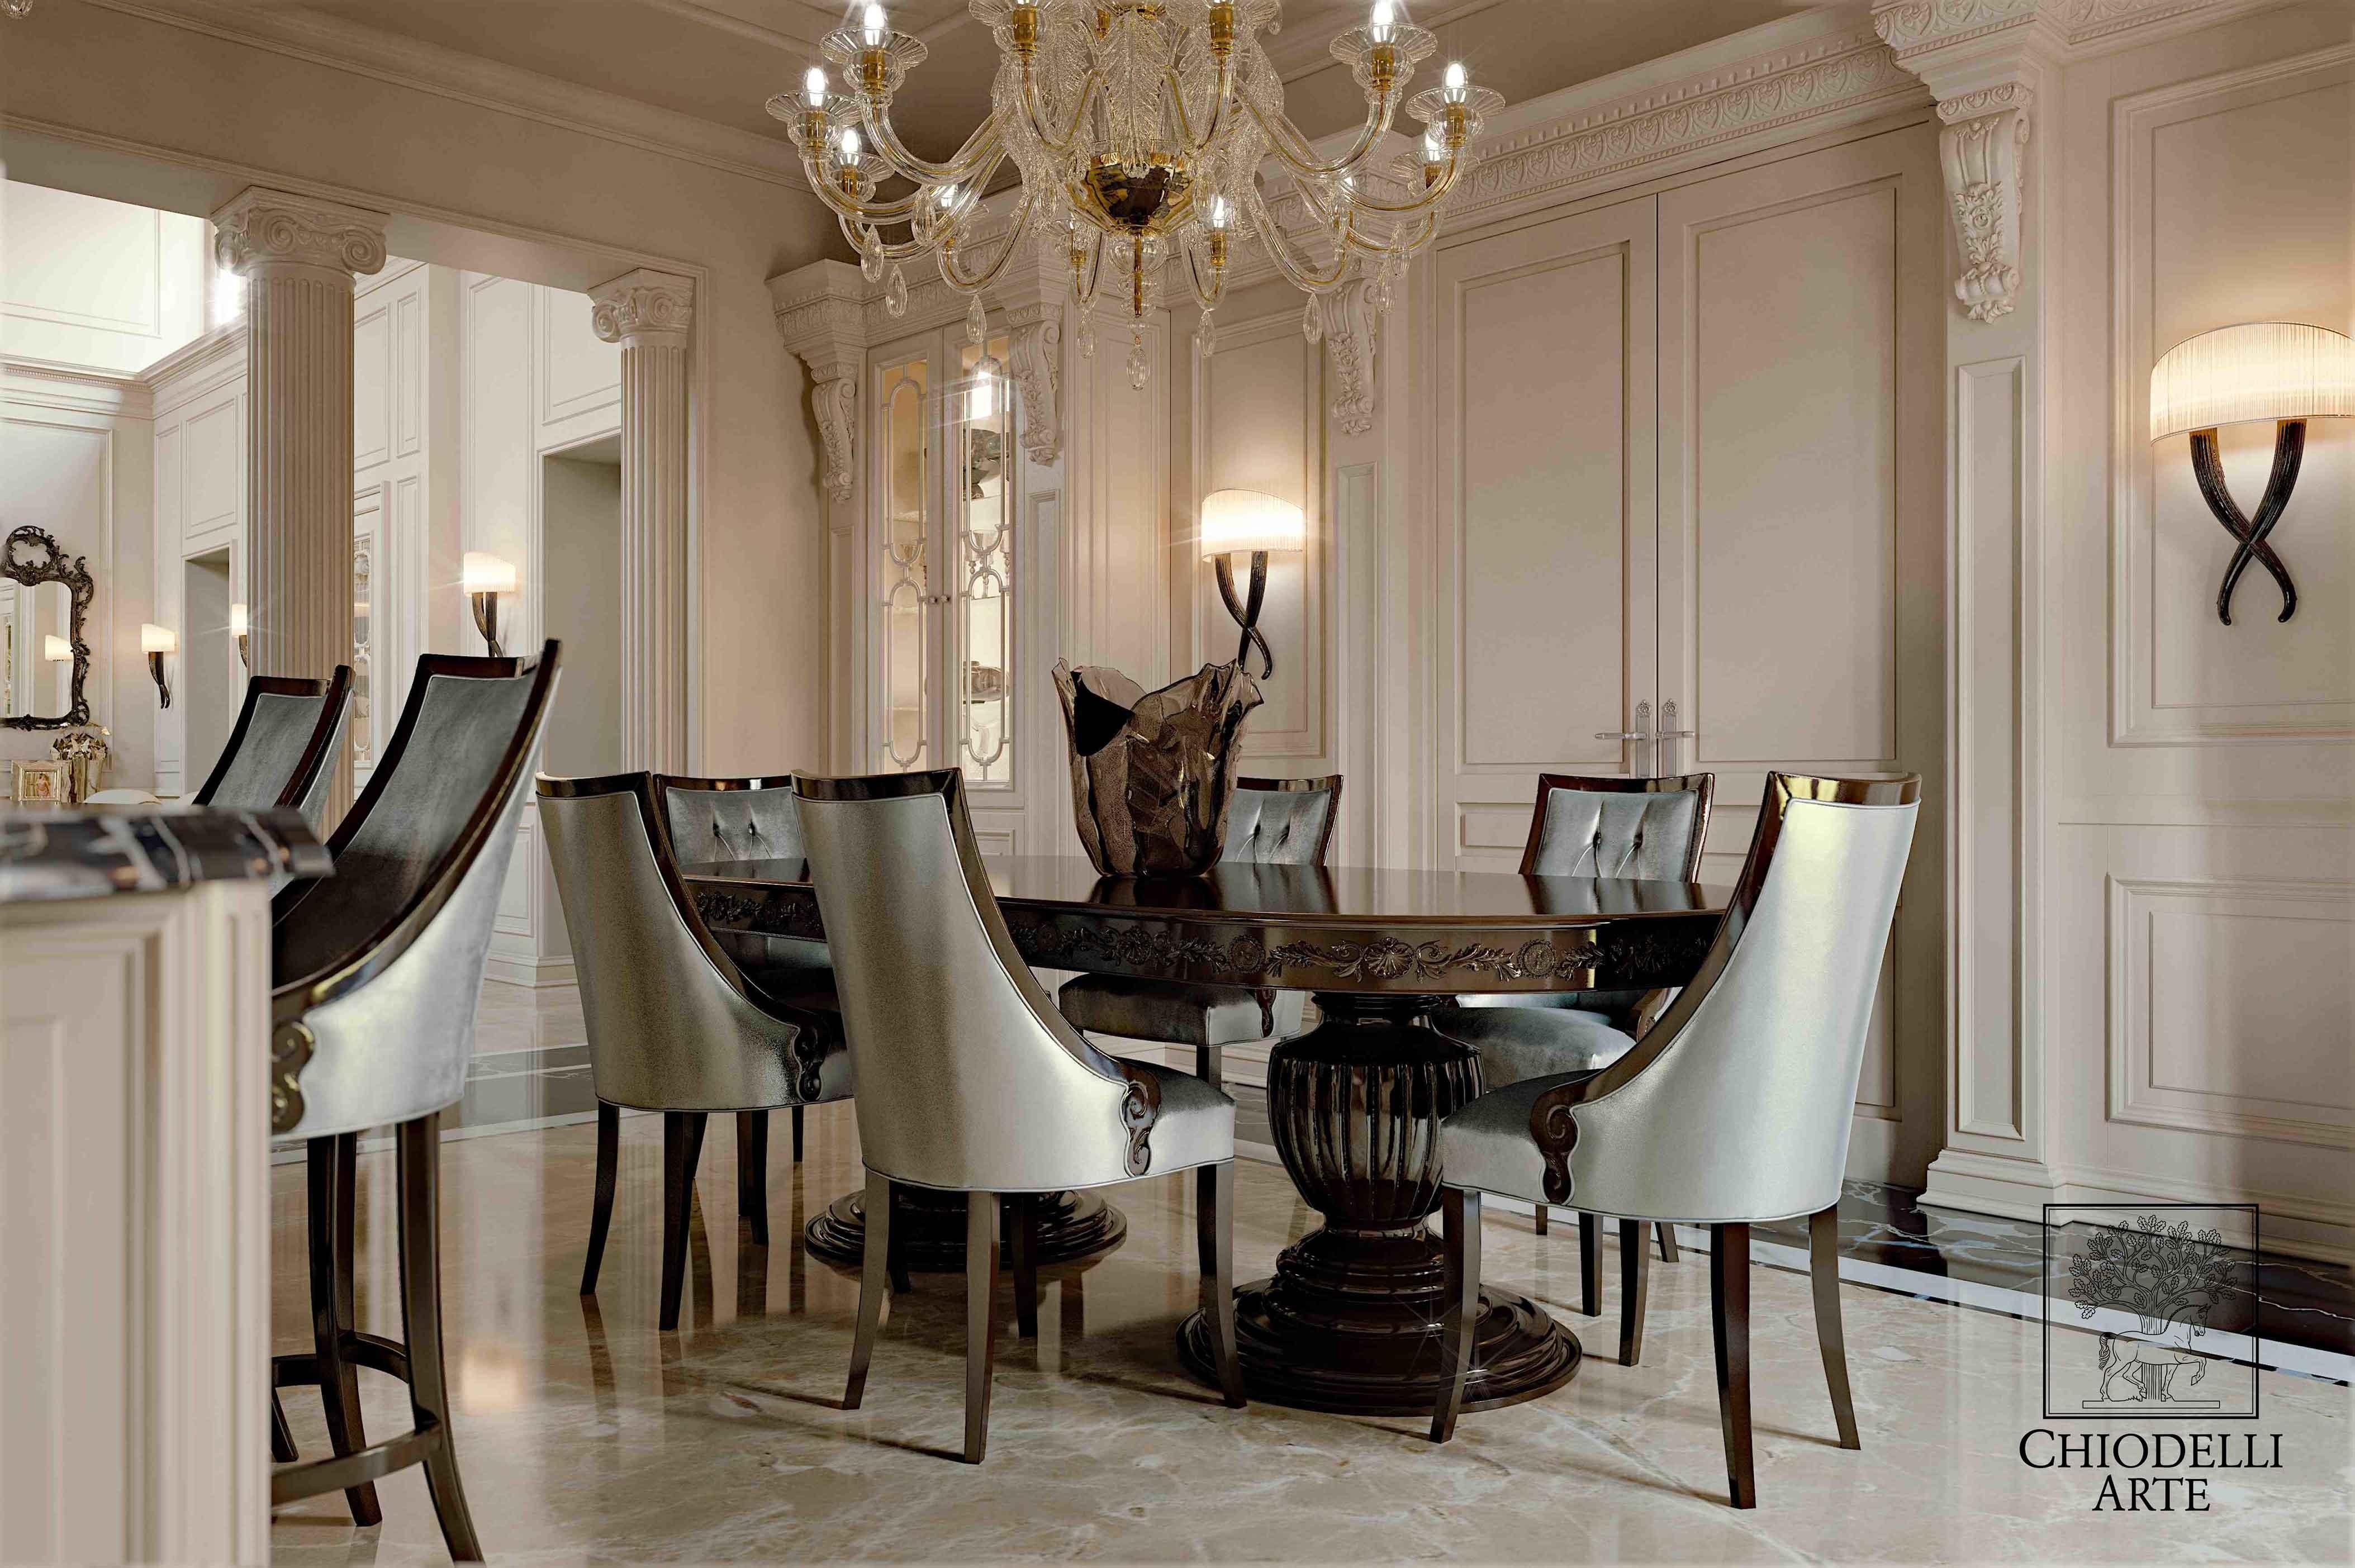 For a luxurious lunch - التصميم الداخلي